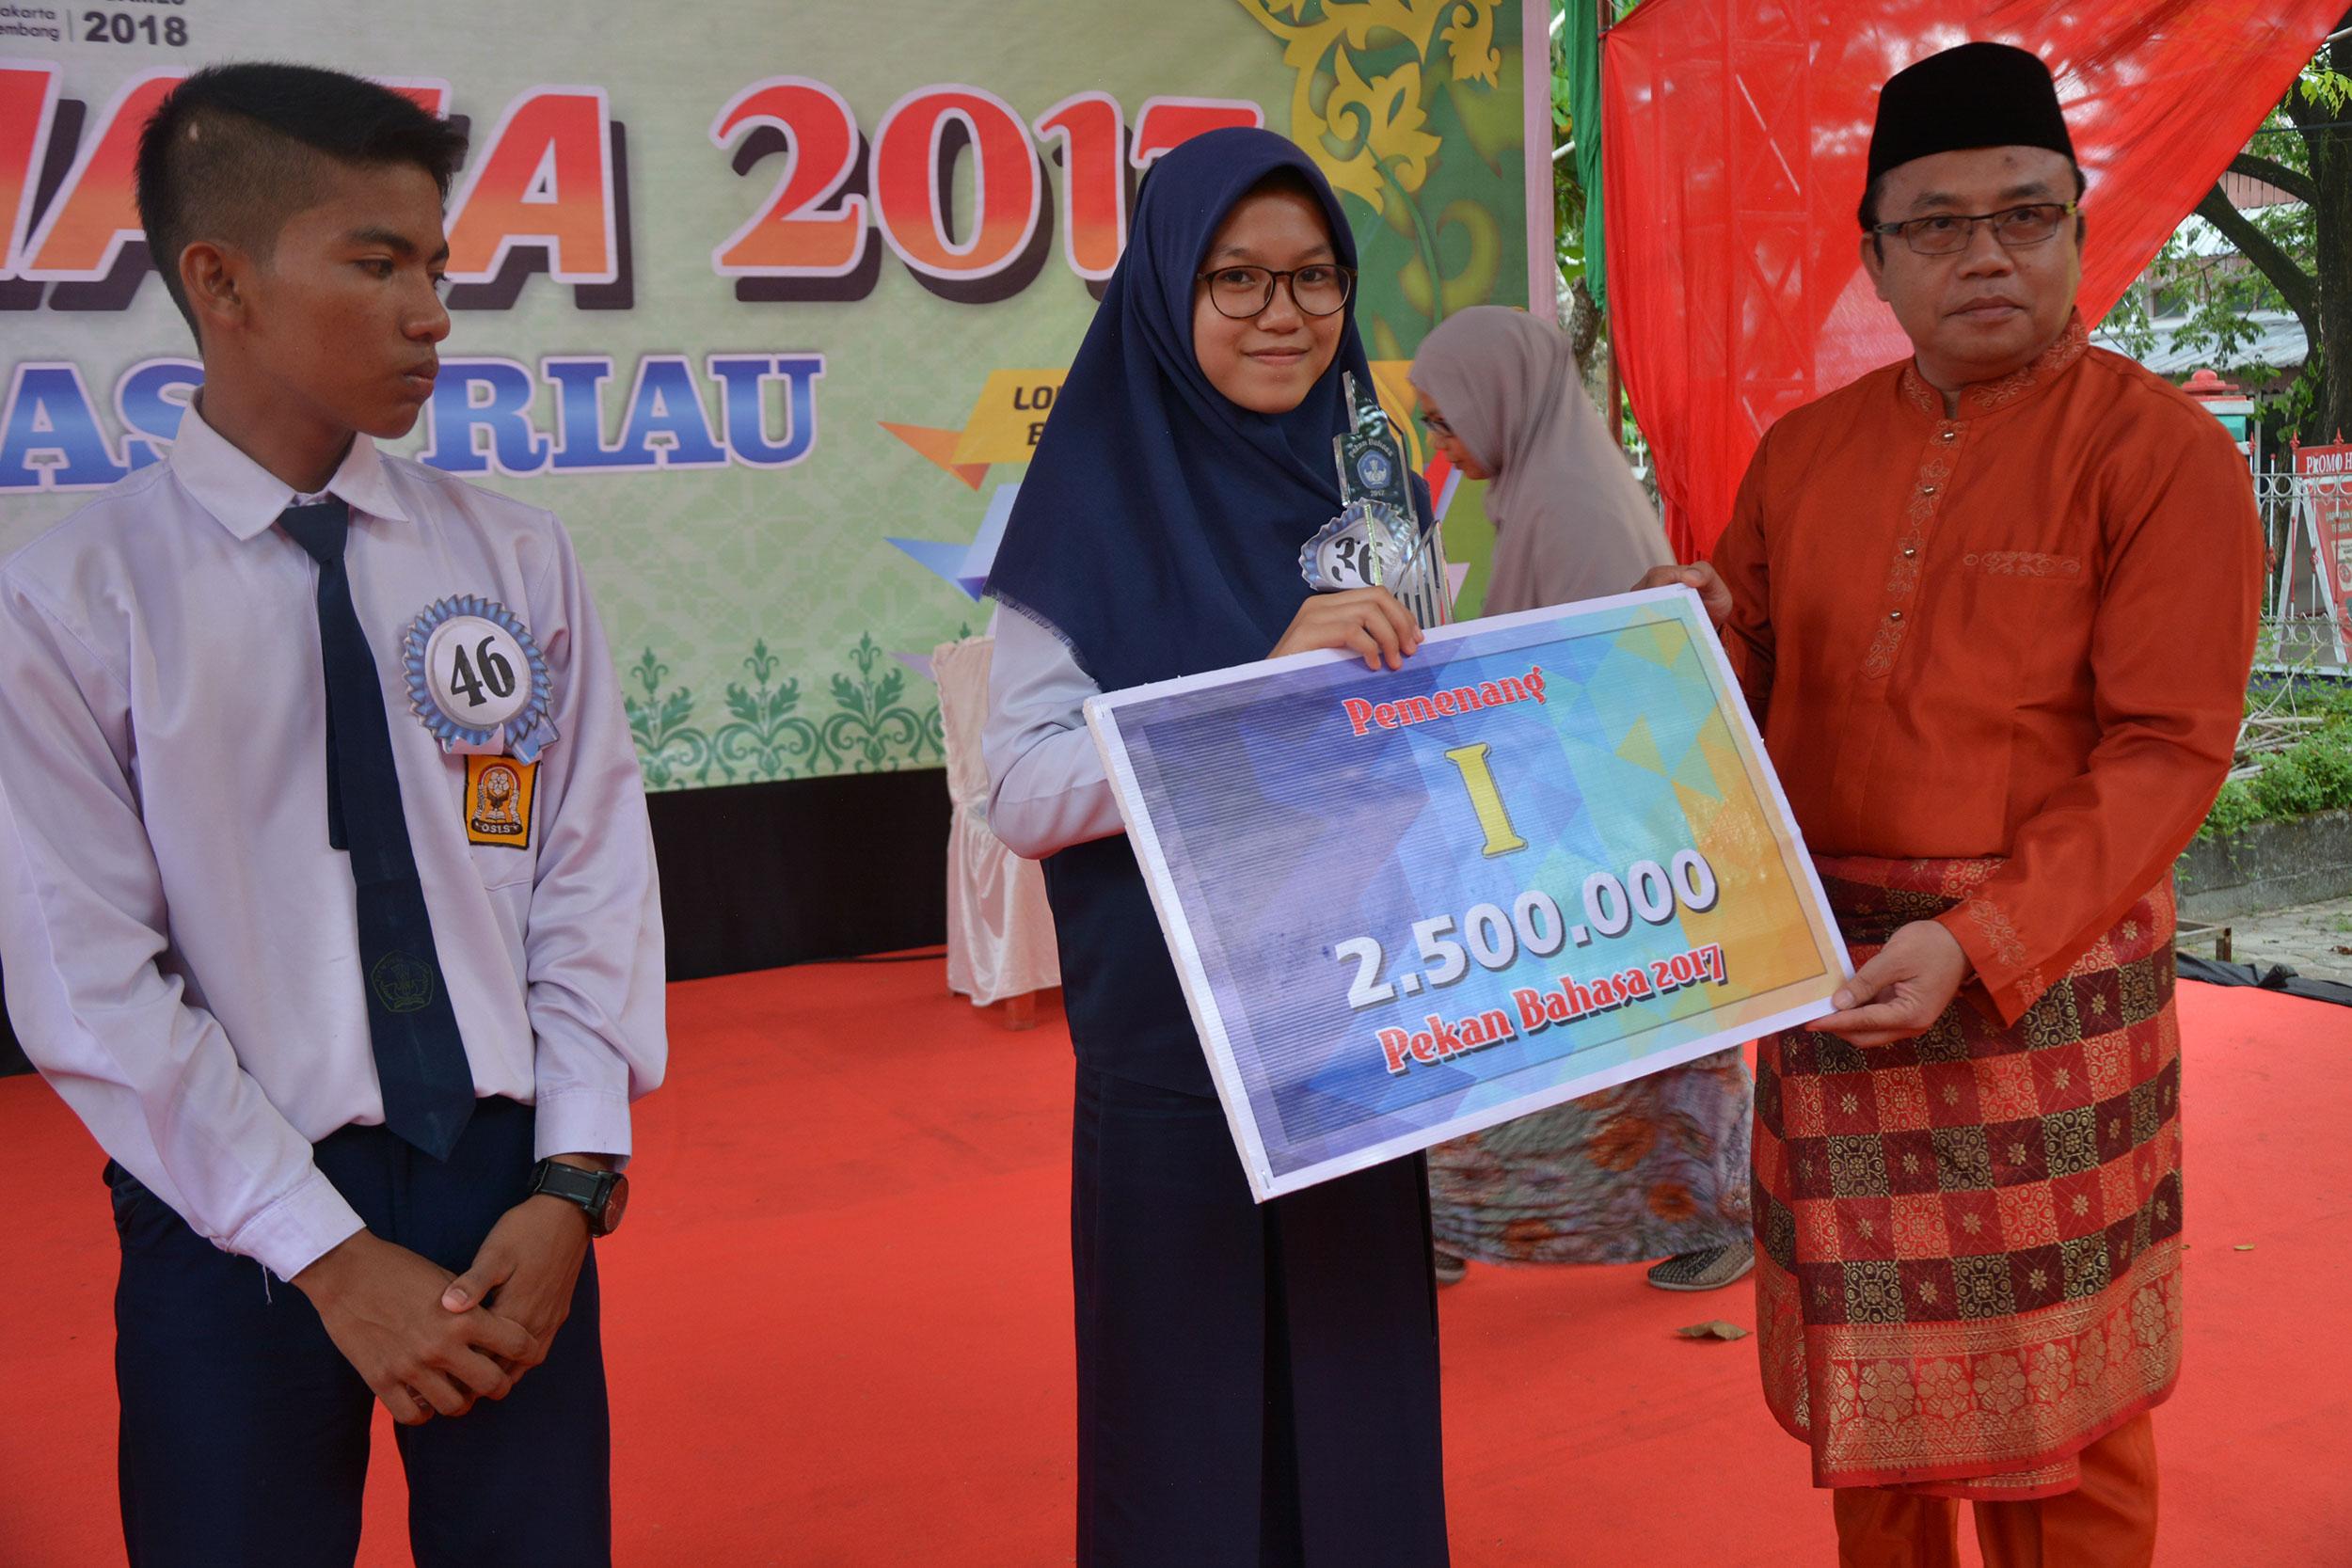 SMPN 1 Pekanbaru Wakili Riau ke Tingkat Regional – Pekan Bahasa 2017